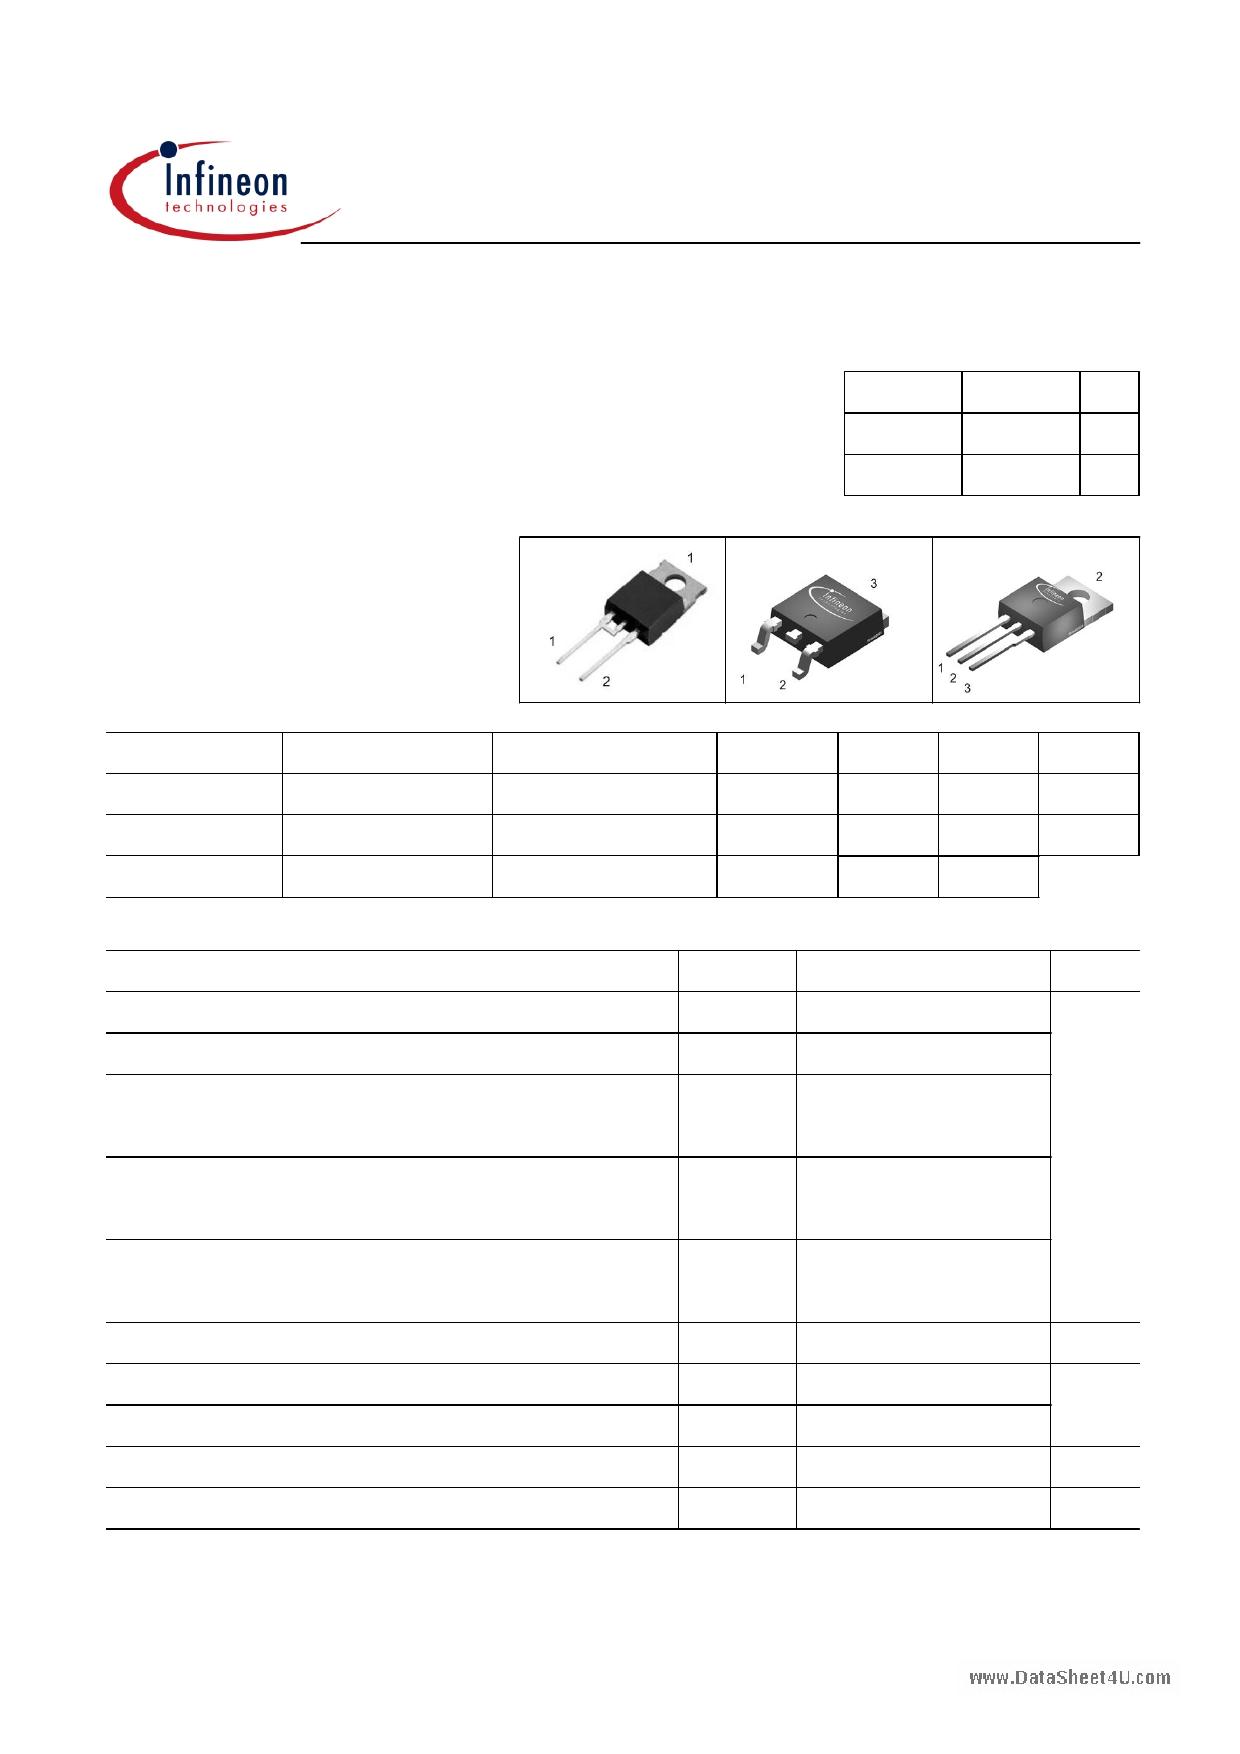 D04S60 datasheet